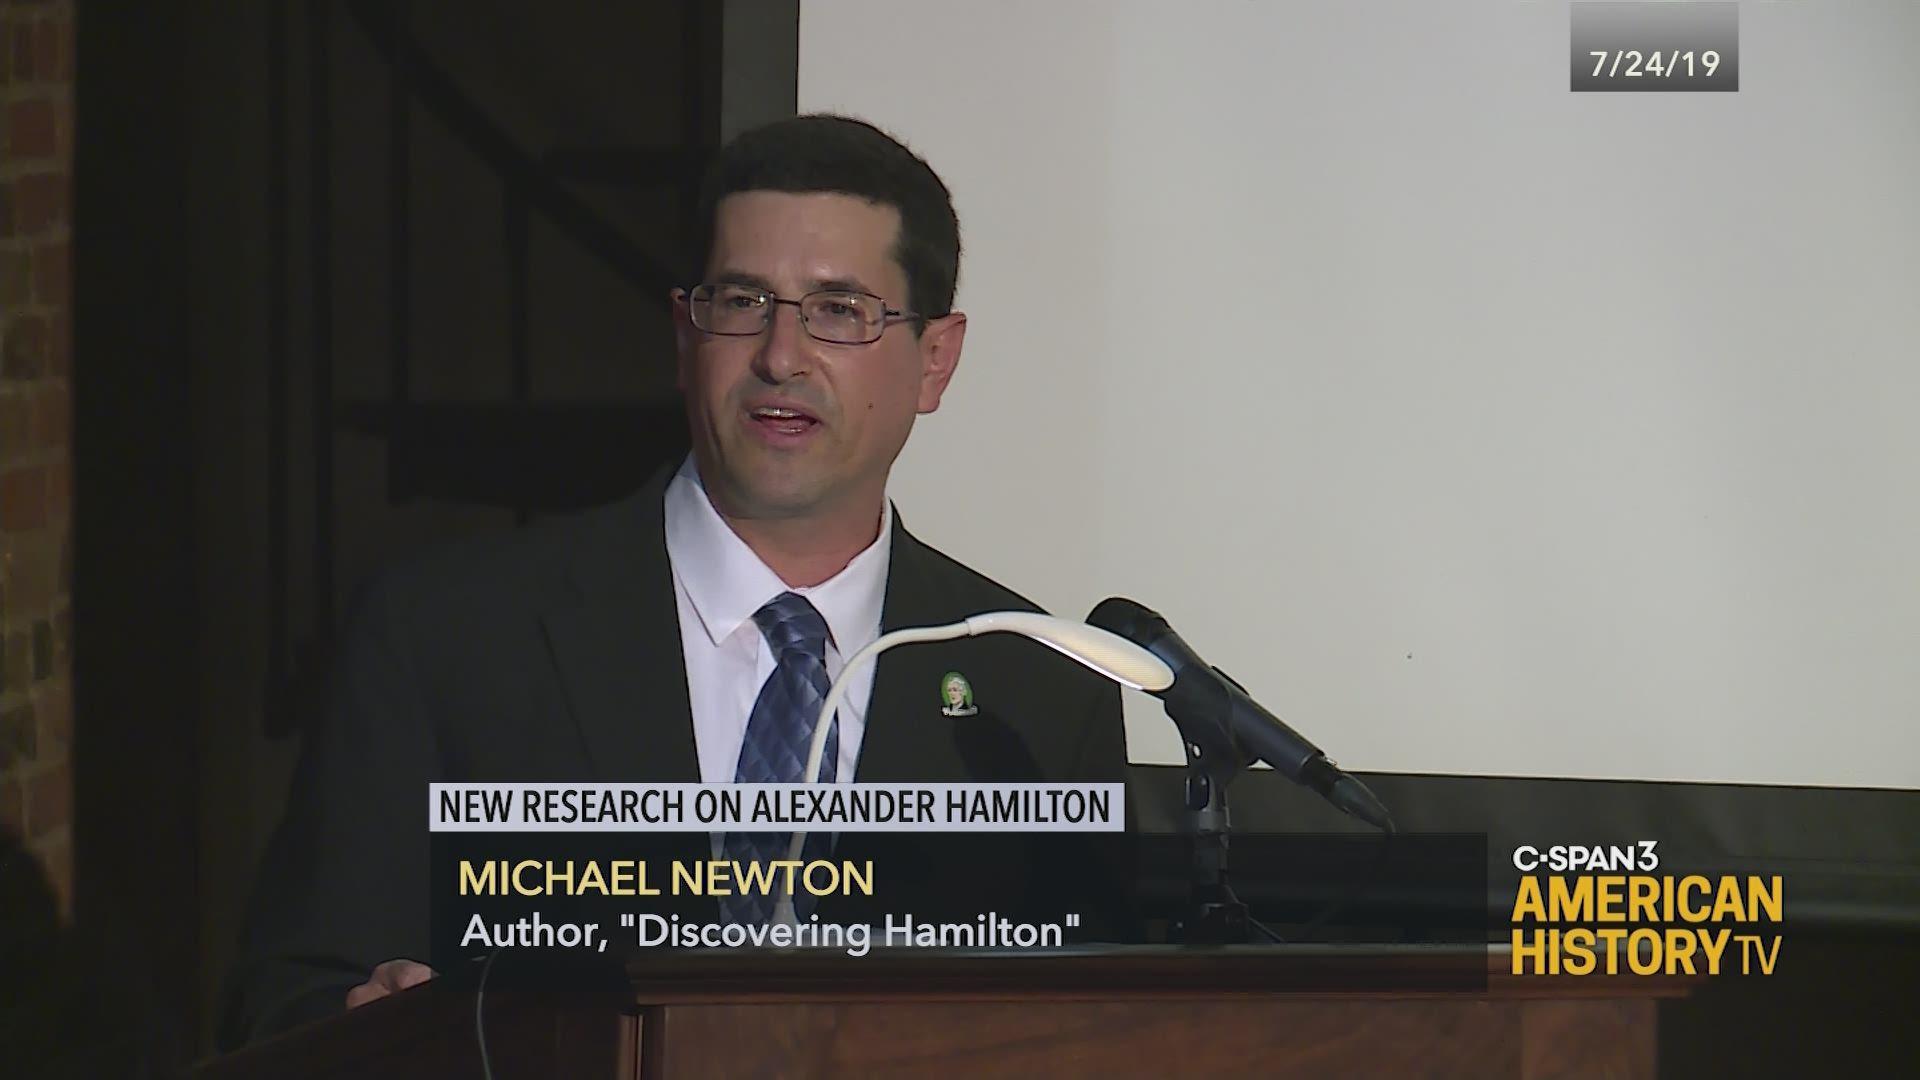 New Research on Alexander Hamilton